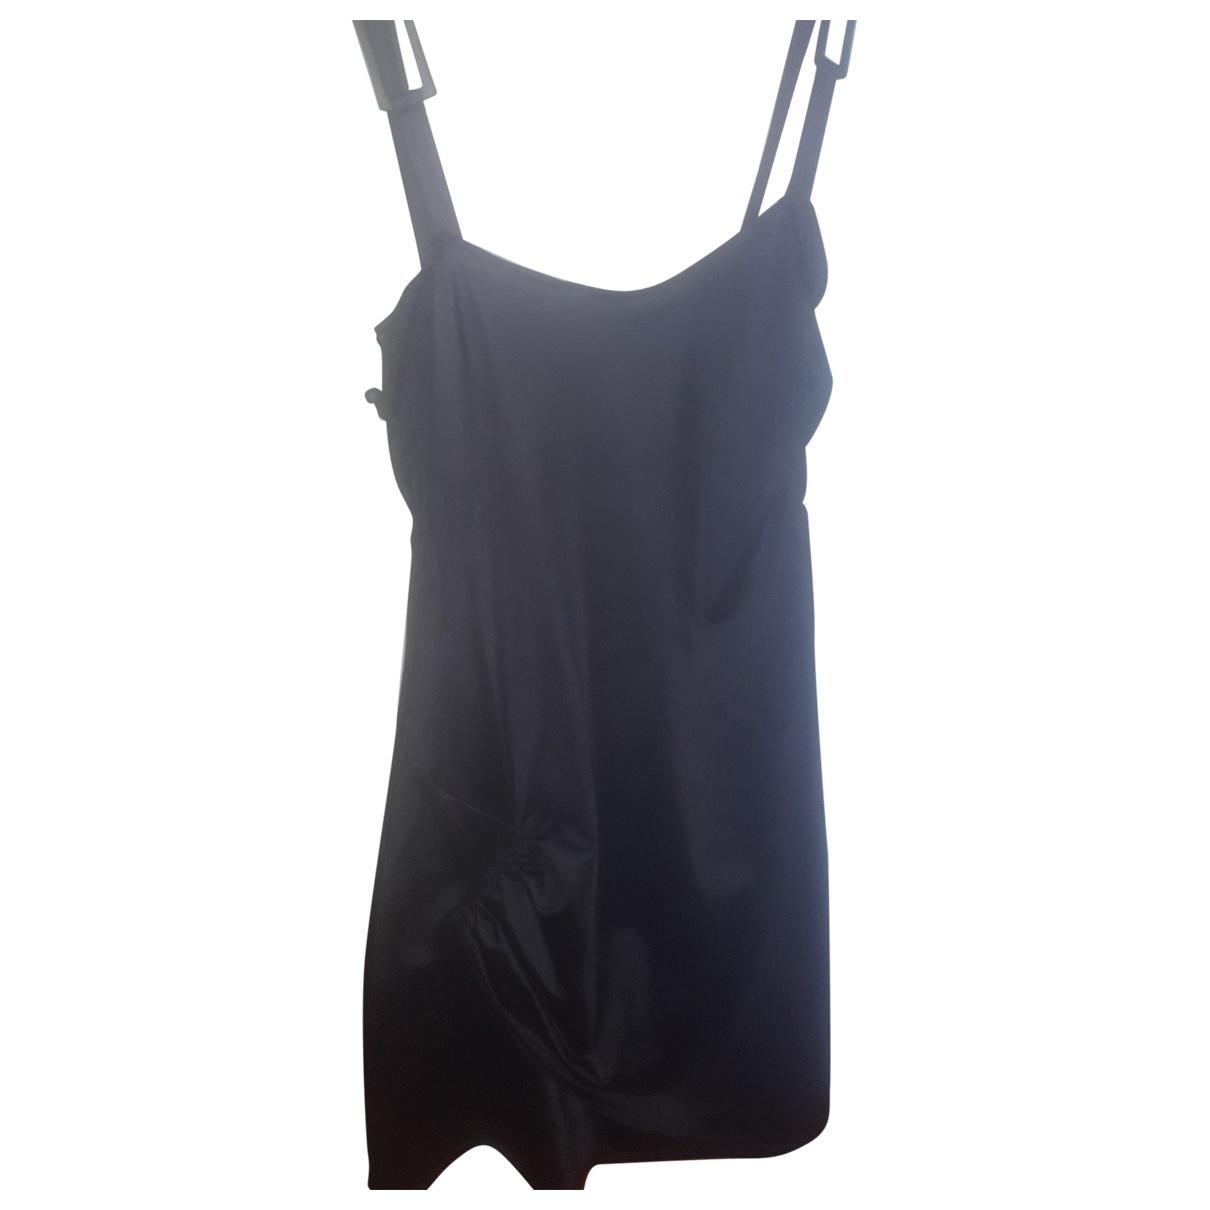 Emporio Armani \N Black dress for Women 40 IT